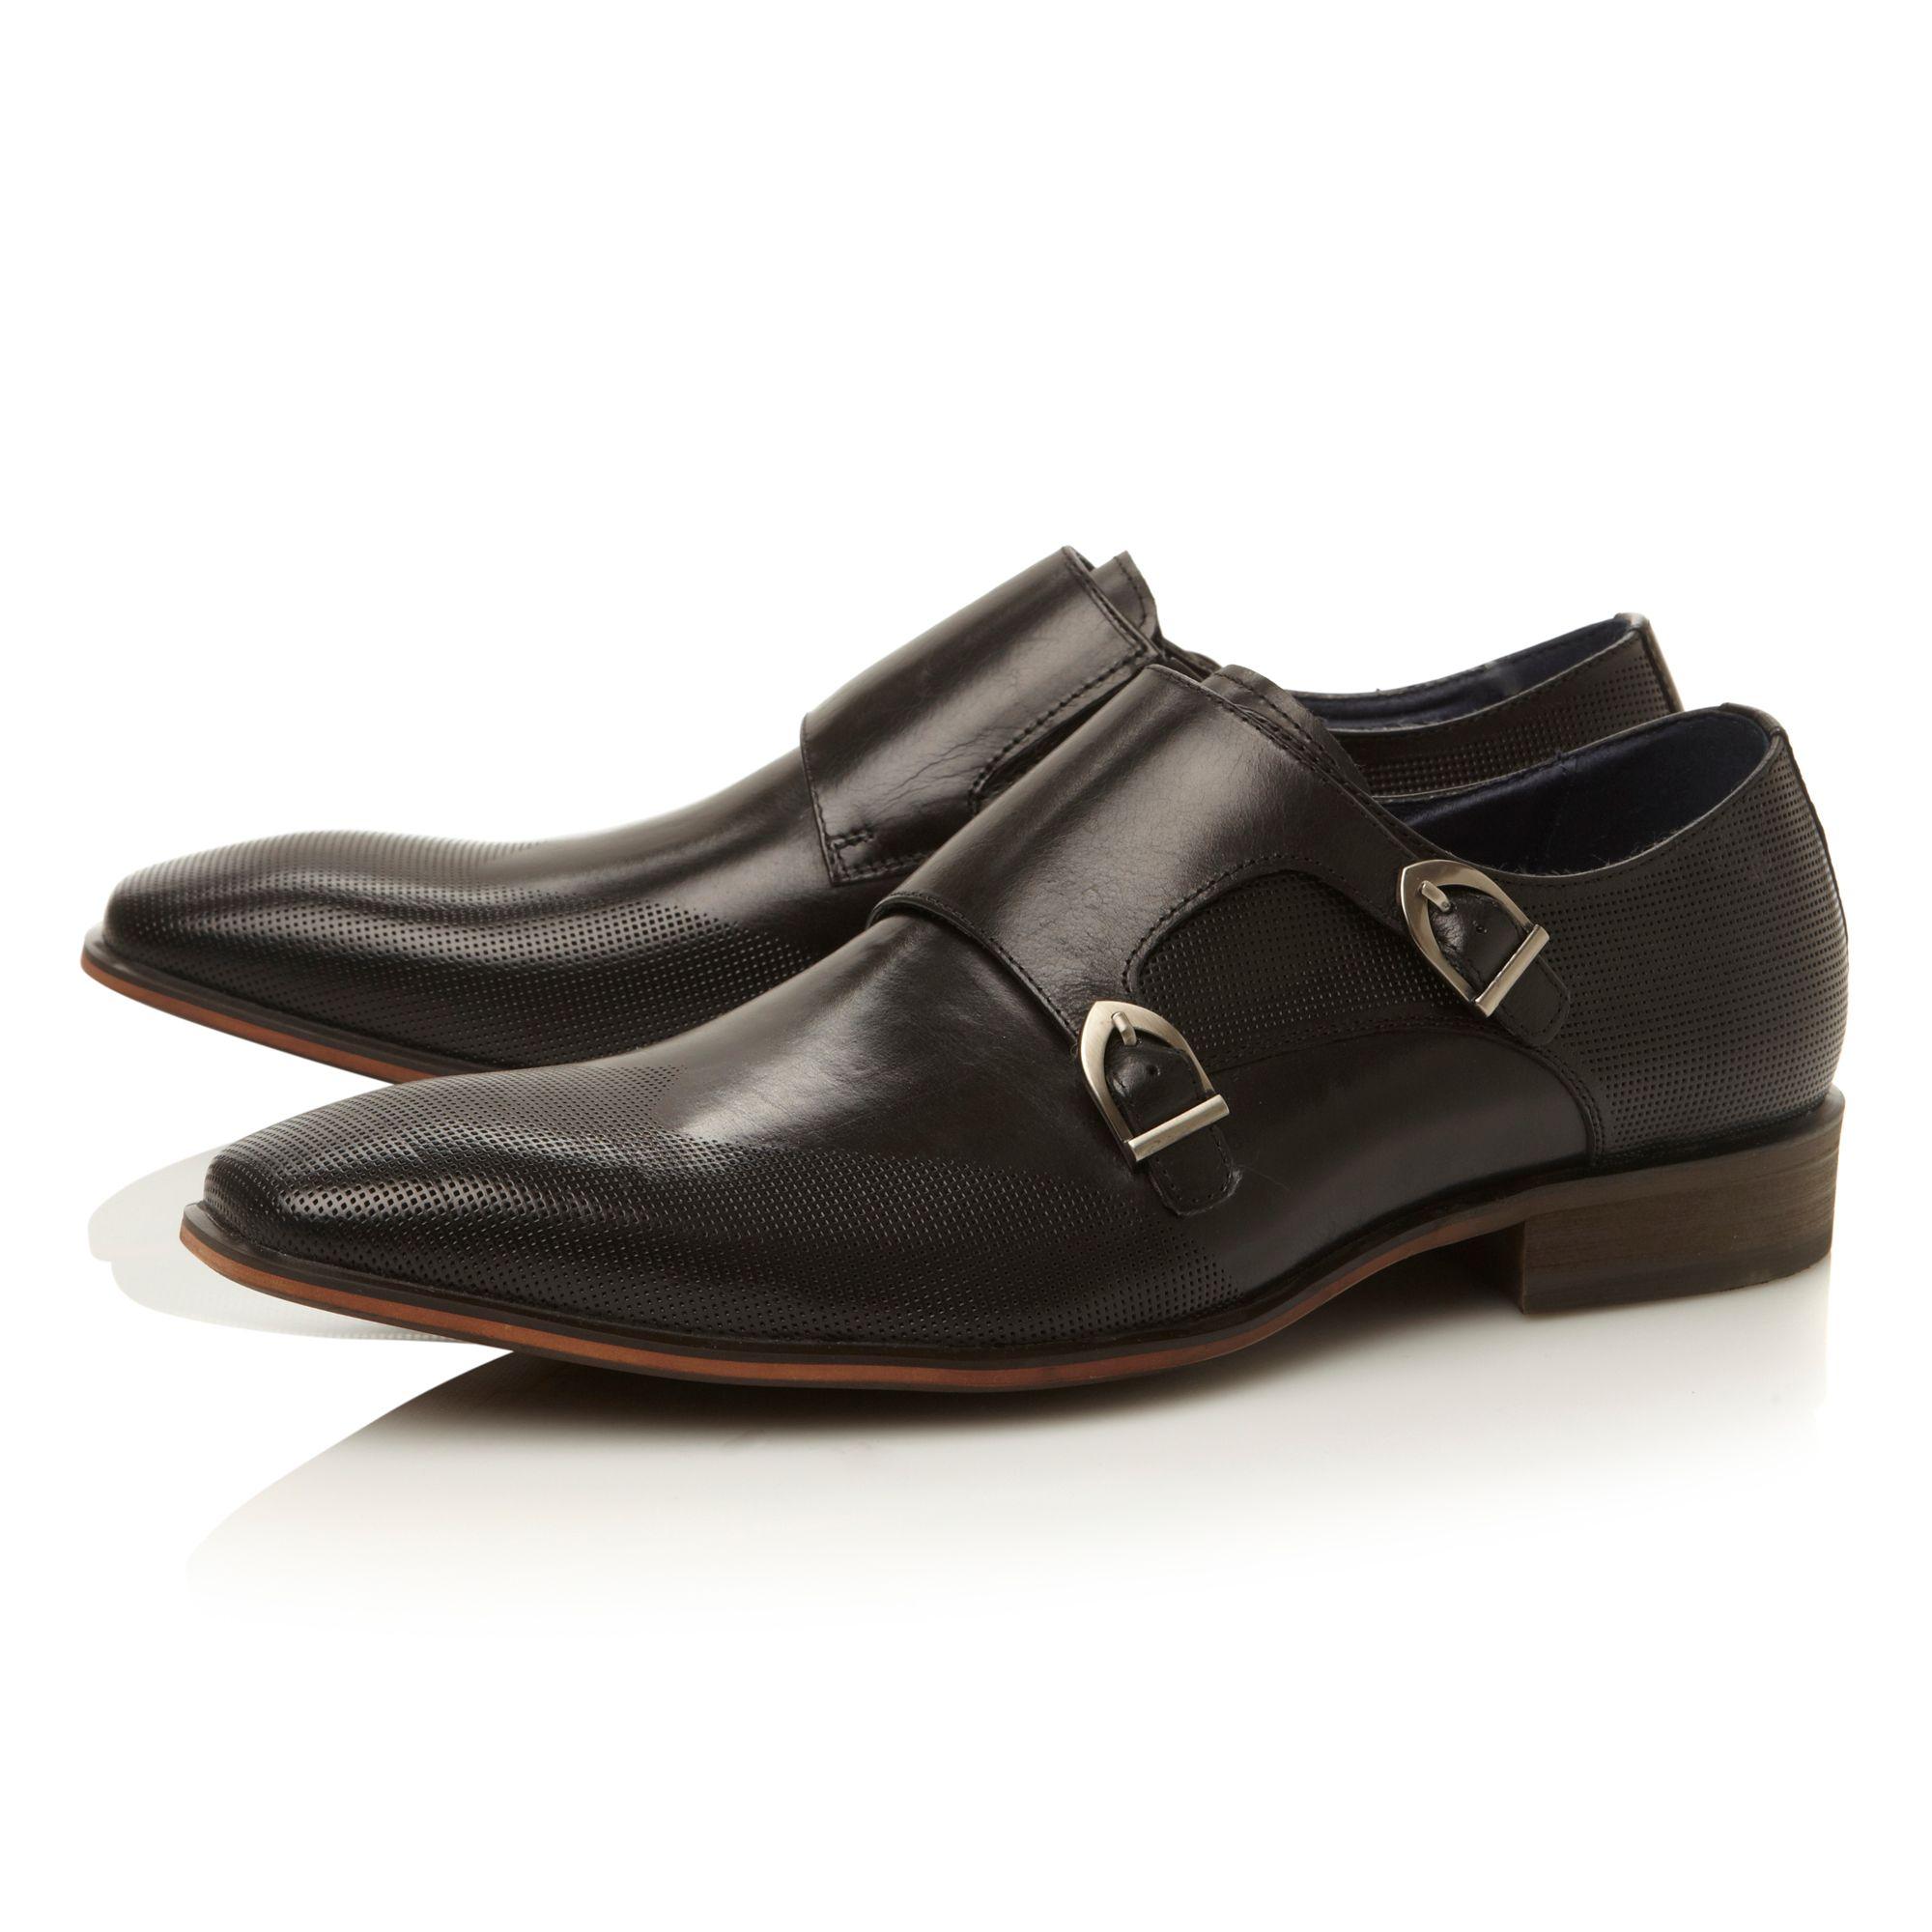 steve madden jerney buckle monk formal shoes in